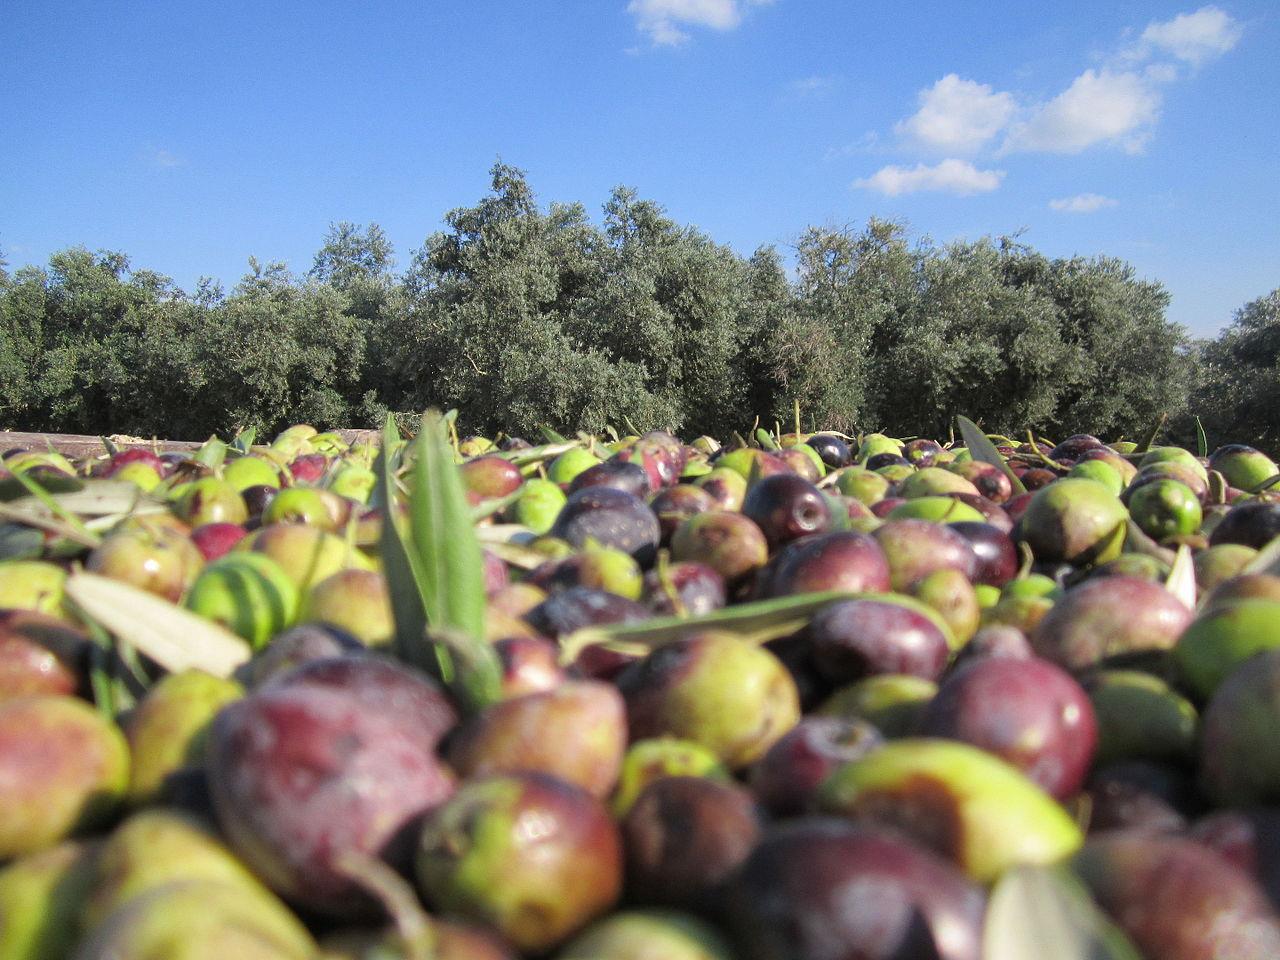 Israel's olive oil